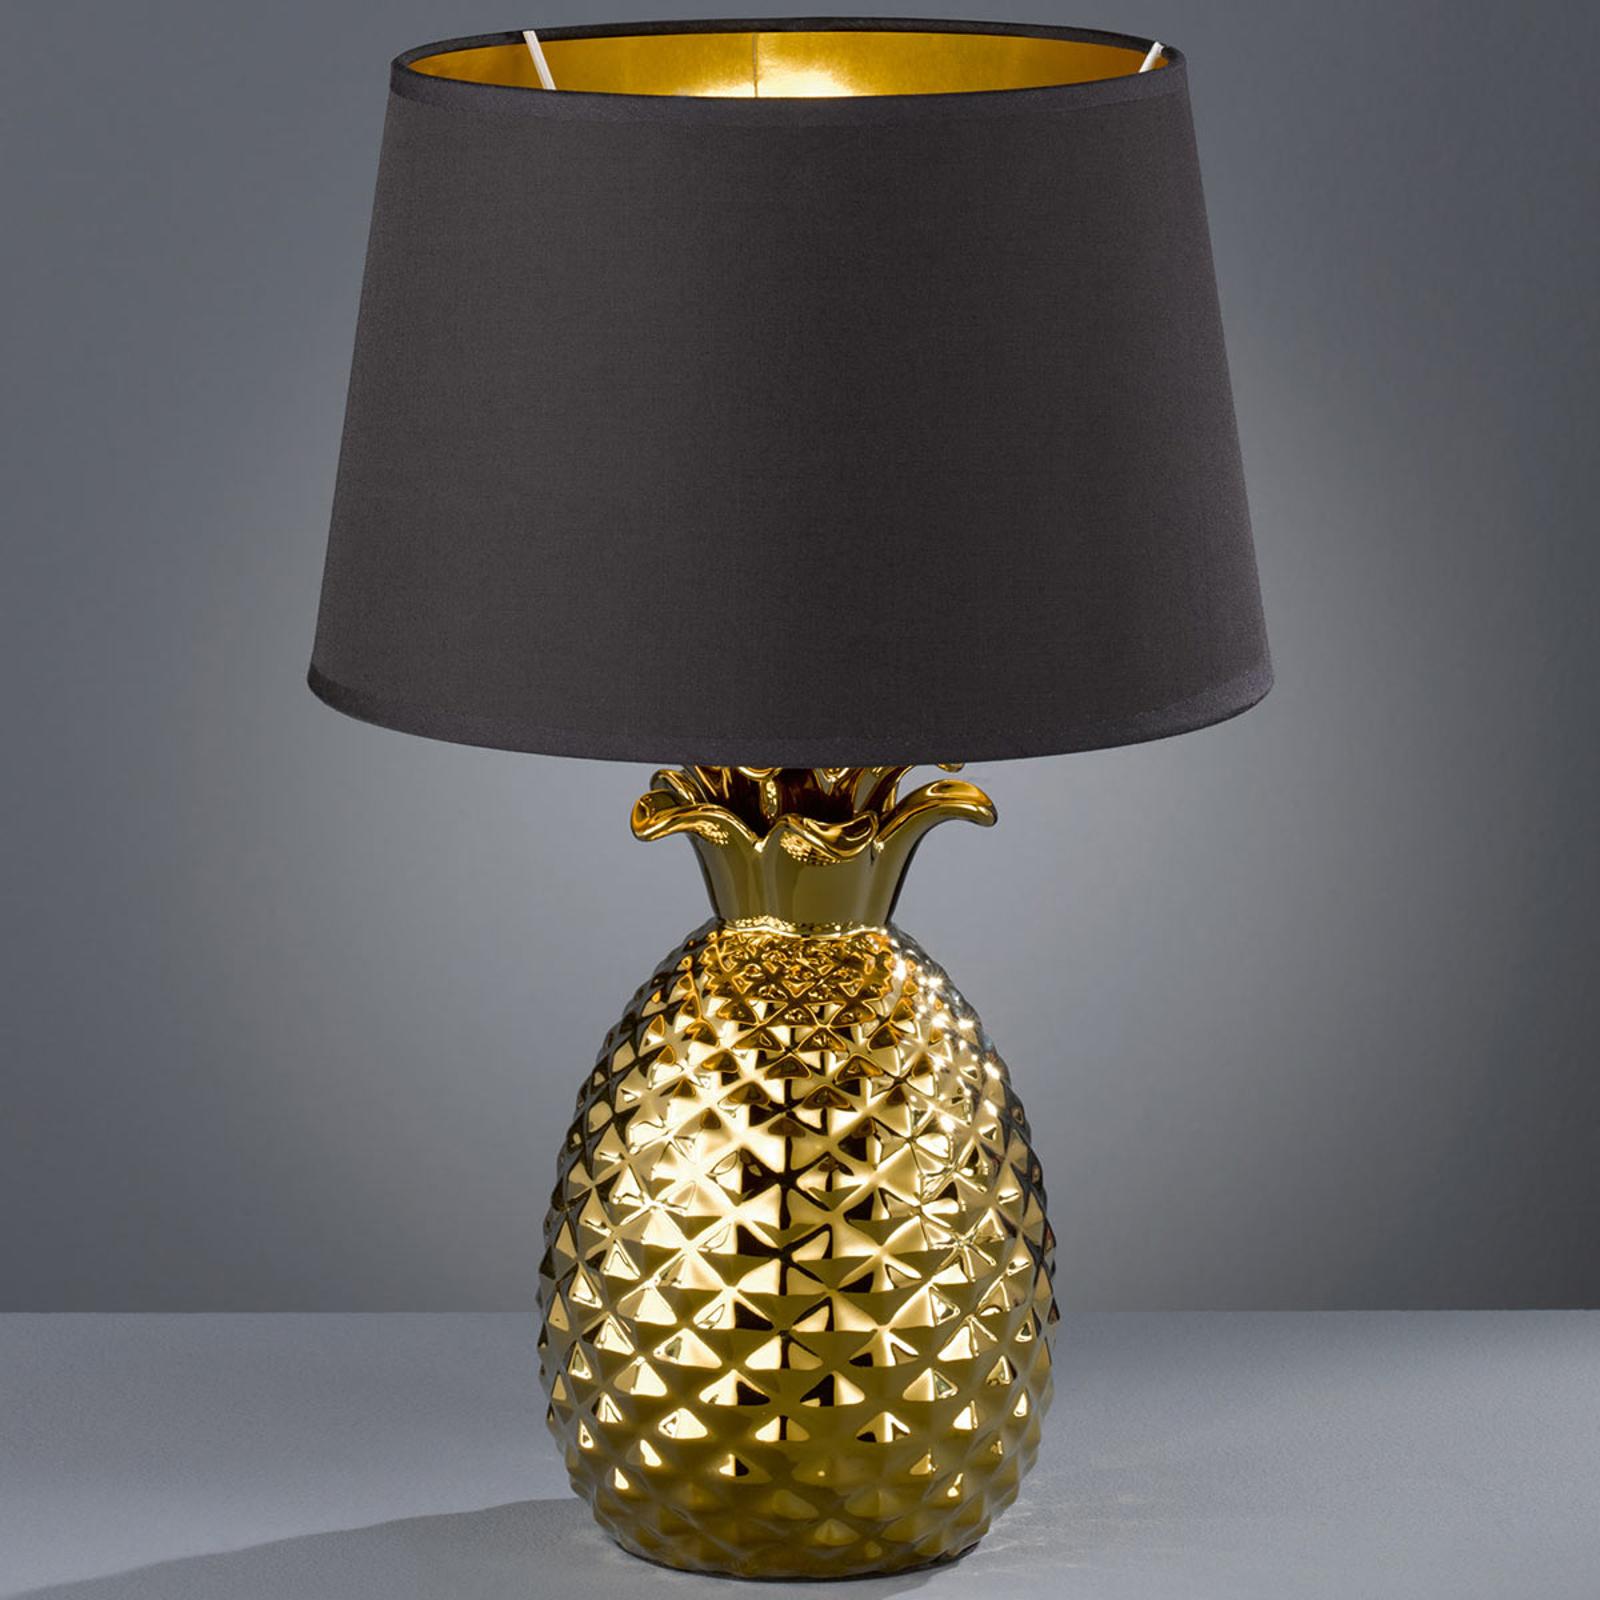 Kulta-musta tekstiili-pöytälamppu Pineapple, 45 cm